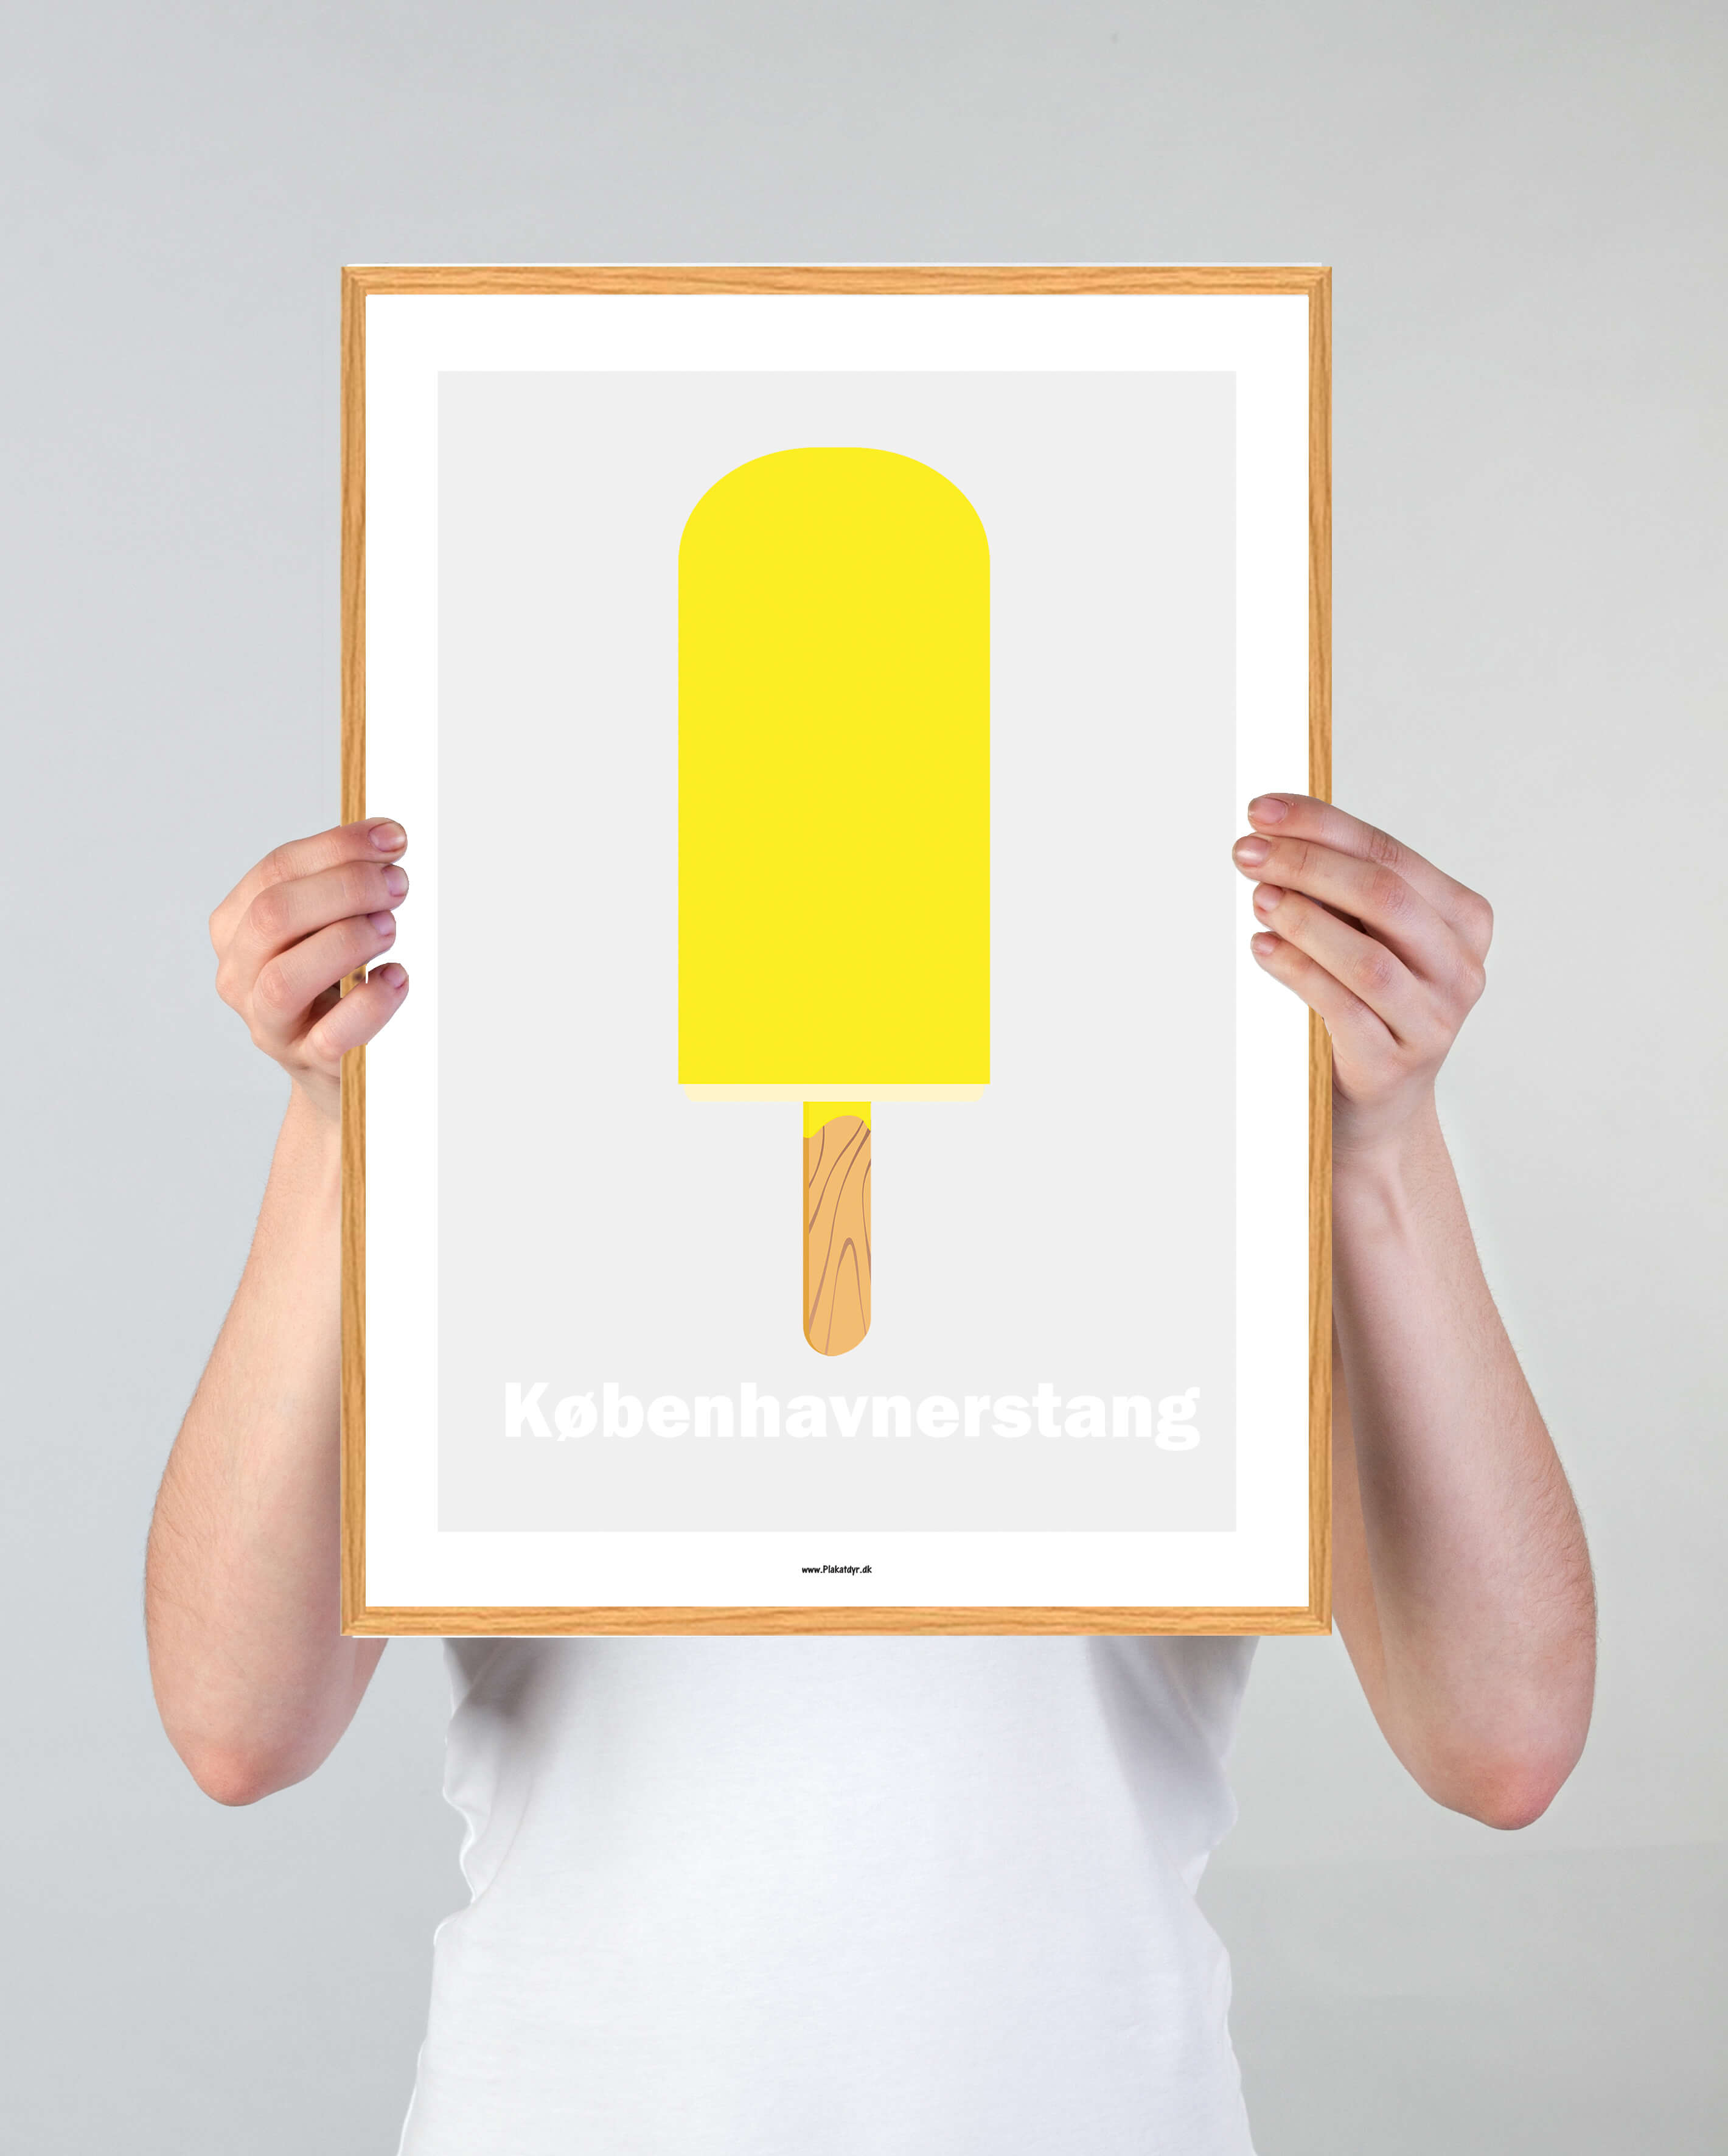 koebenhavnerstang-plakat-graa